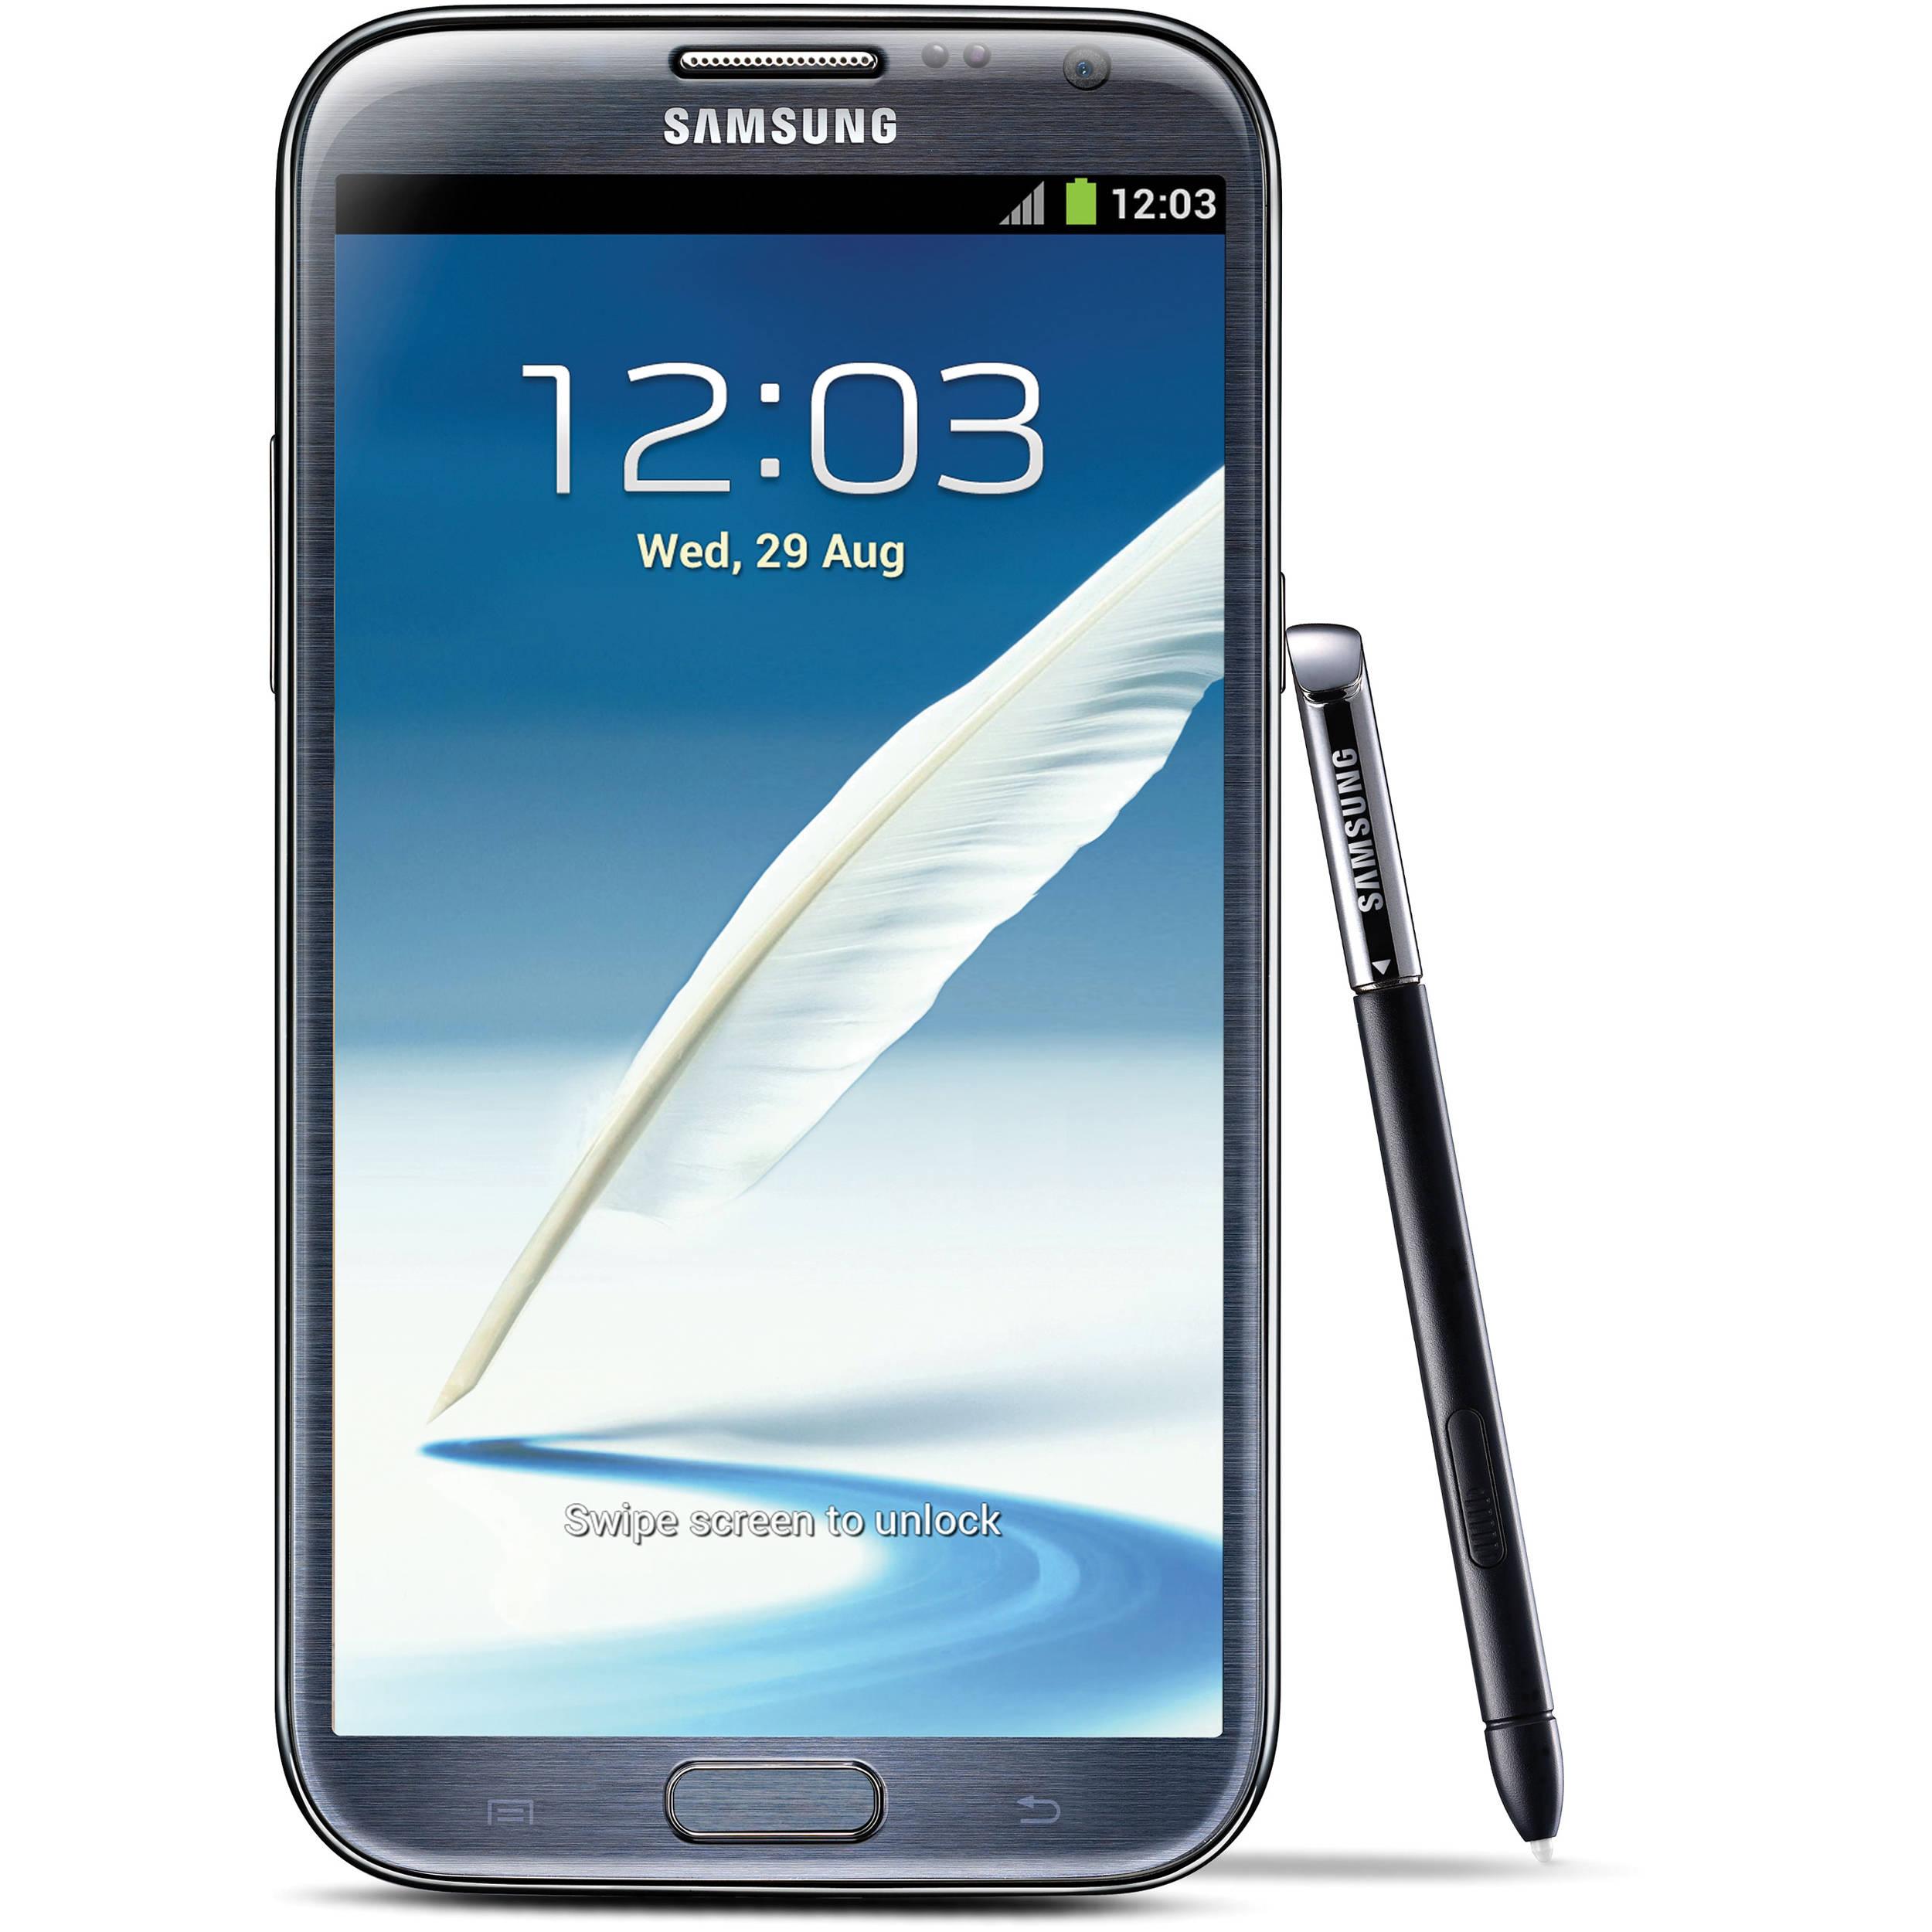 Samsung Galaxy Note 2 White Samsung Galaxy Note 2 Sgh I317